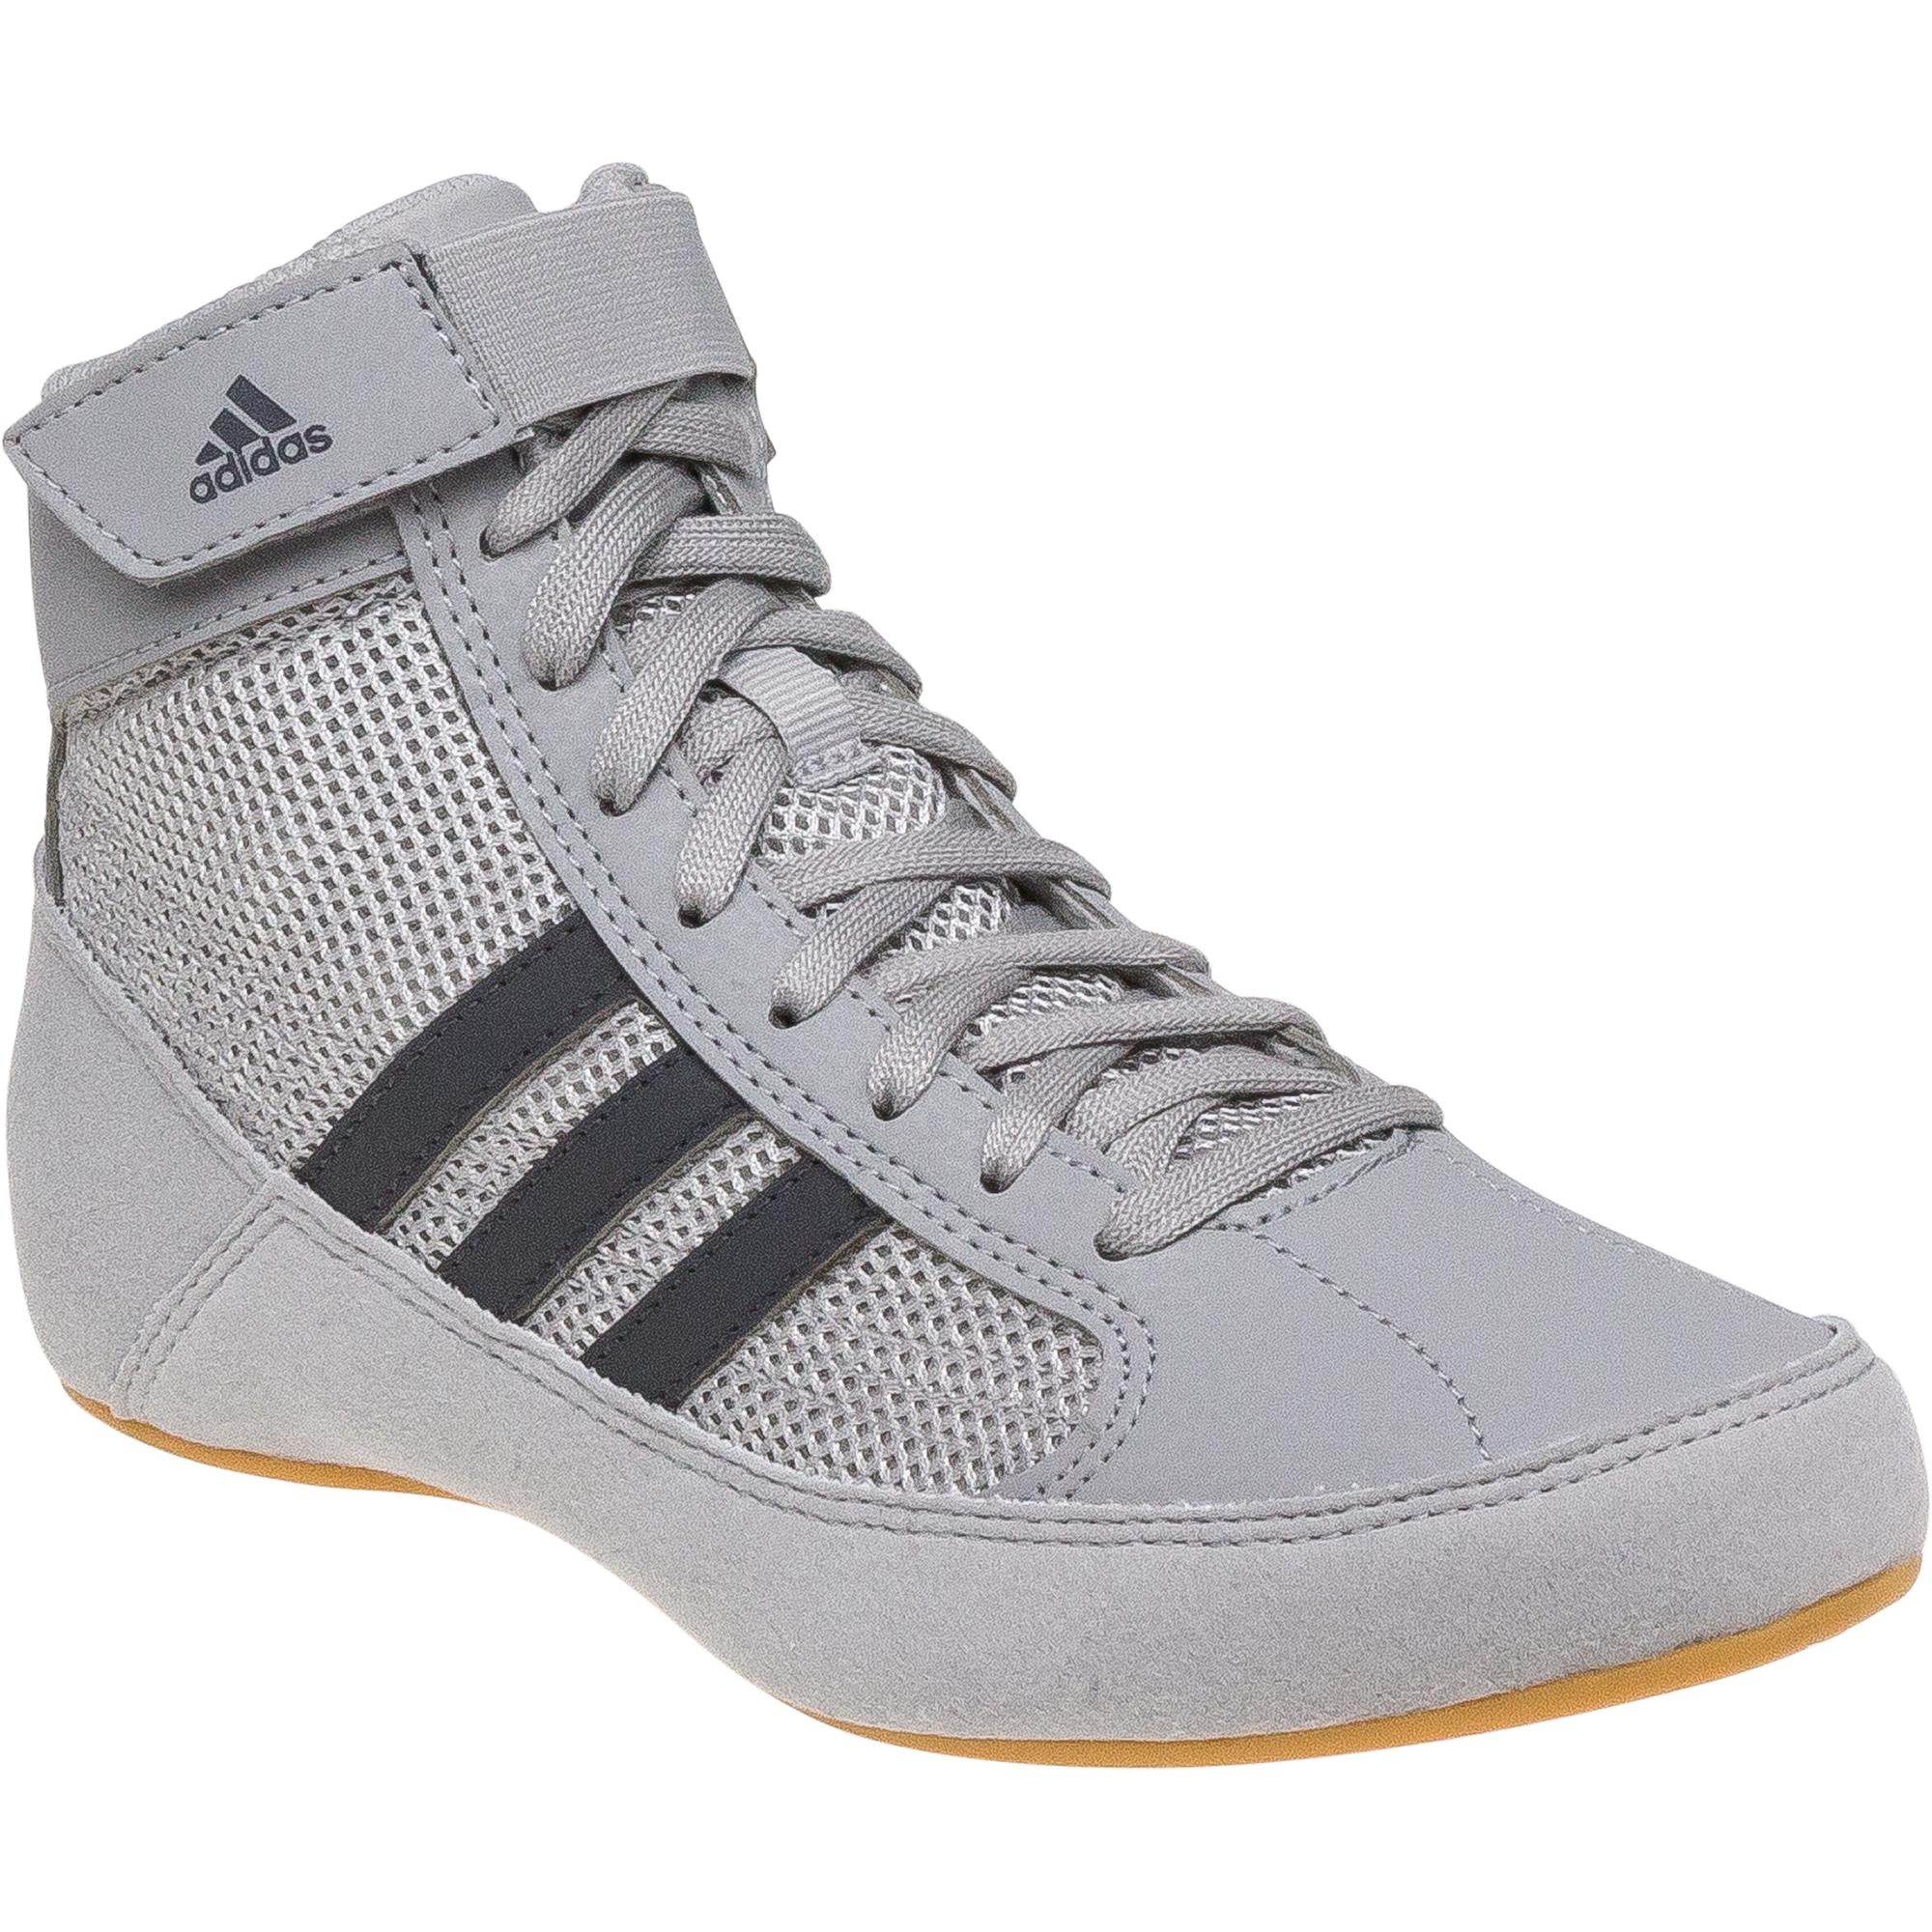 b13e82e7 Home · Wrestling Shoes · Adidas Youth HVC 2. na. product amin image ...